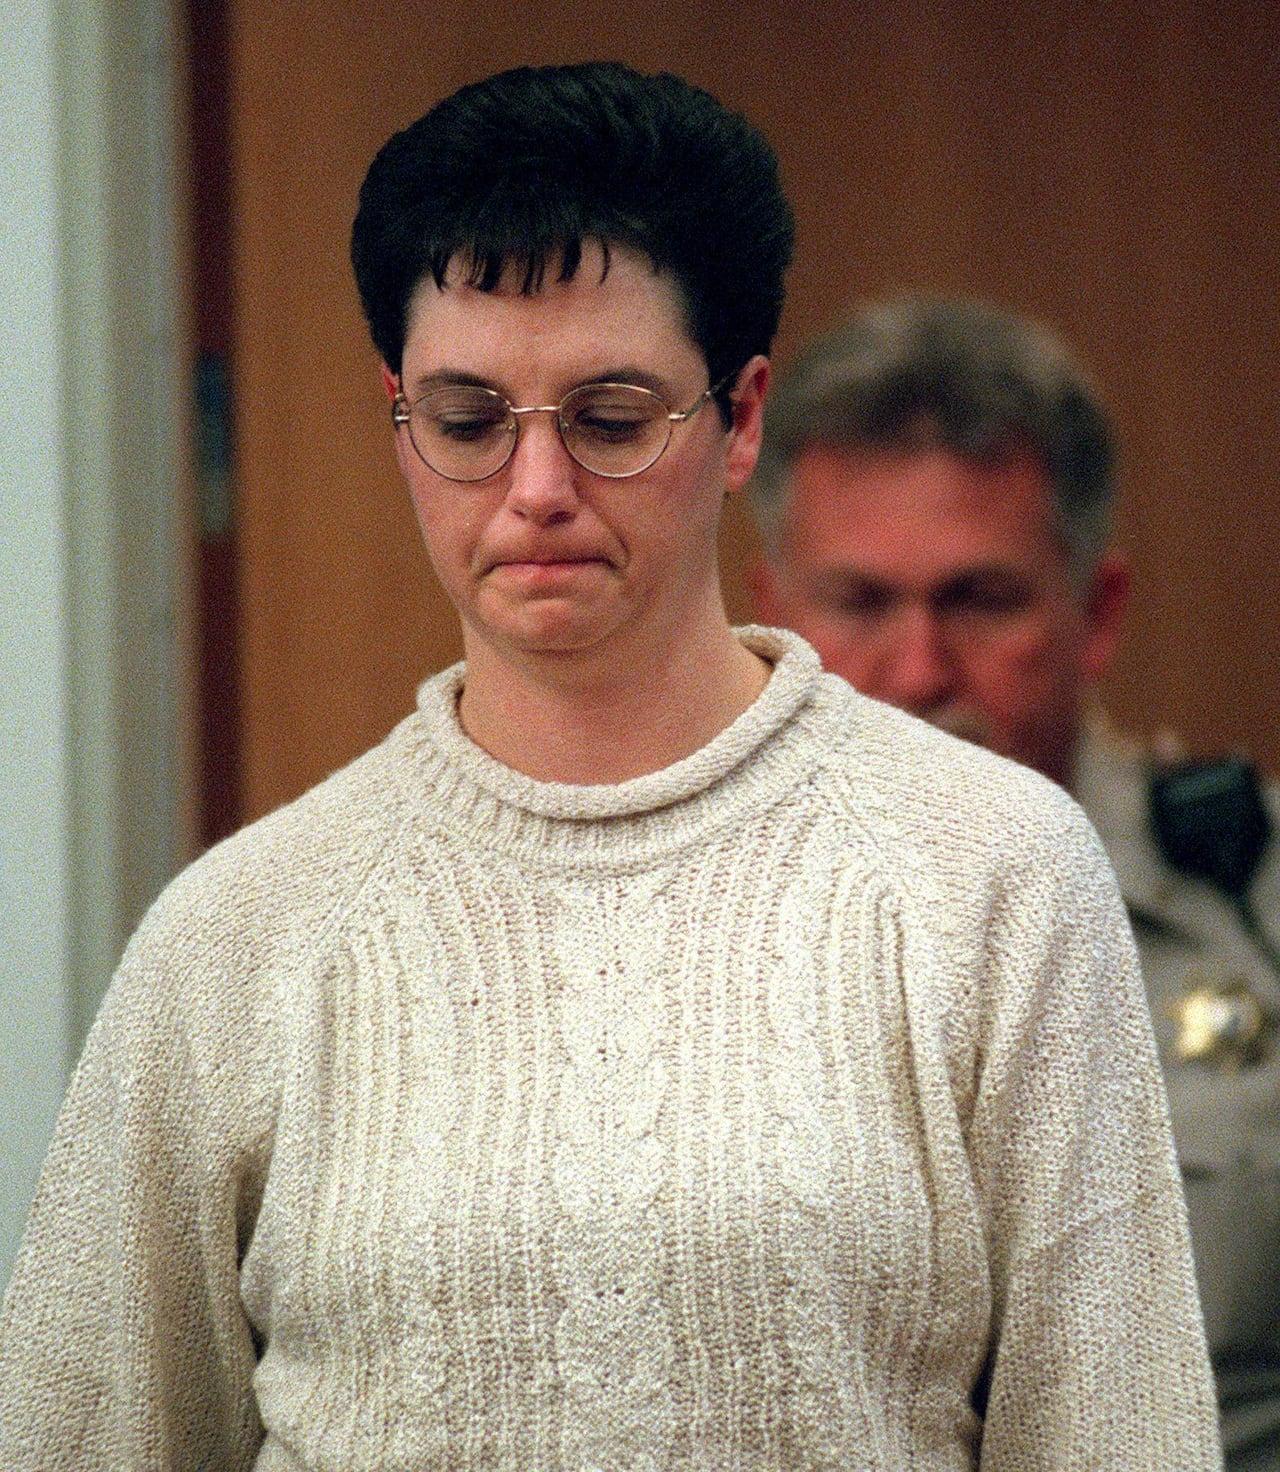 Kelly Gissendaner, Georgia death row inmate, executed   CBC News